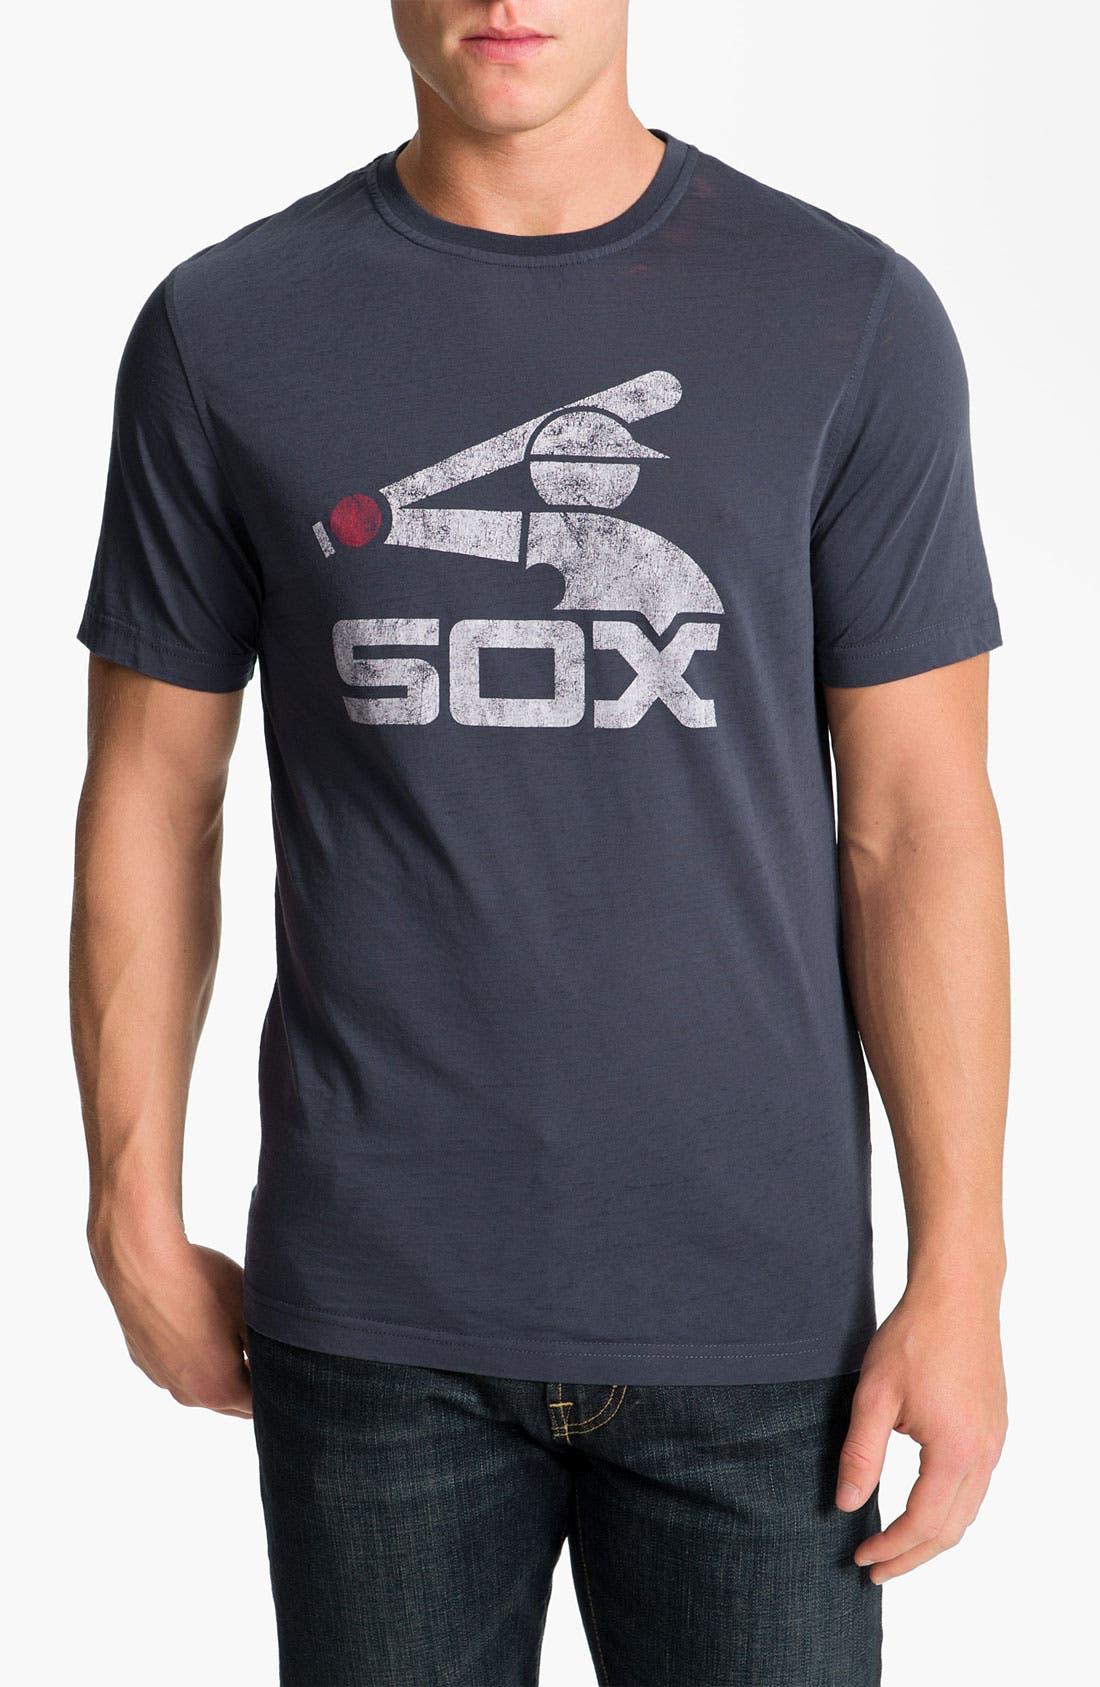 Alternate Image 1 Selected - Red Jacket 'White Sox - Greenwood' T-Shirt